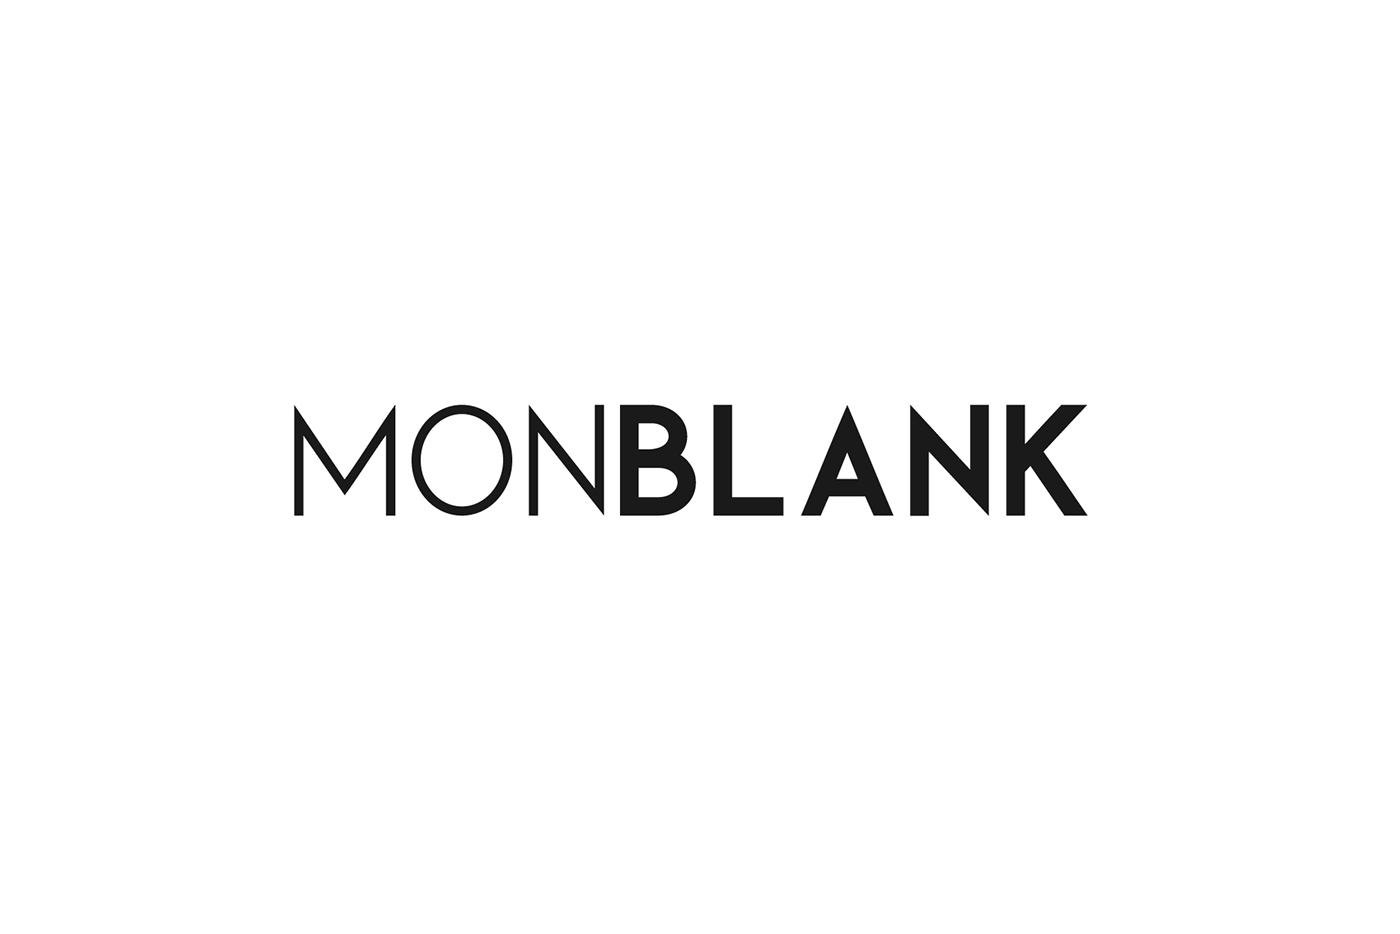 Monblank font family otf type typography   print letter Script sans serif